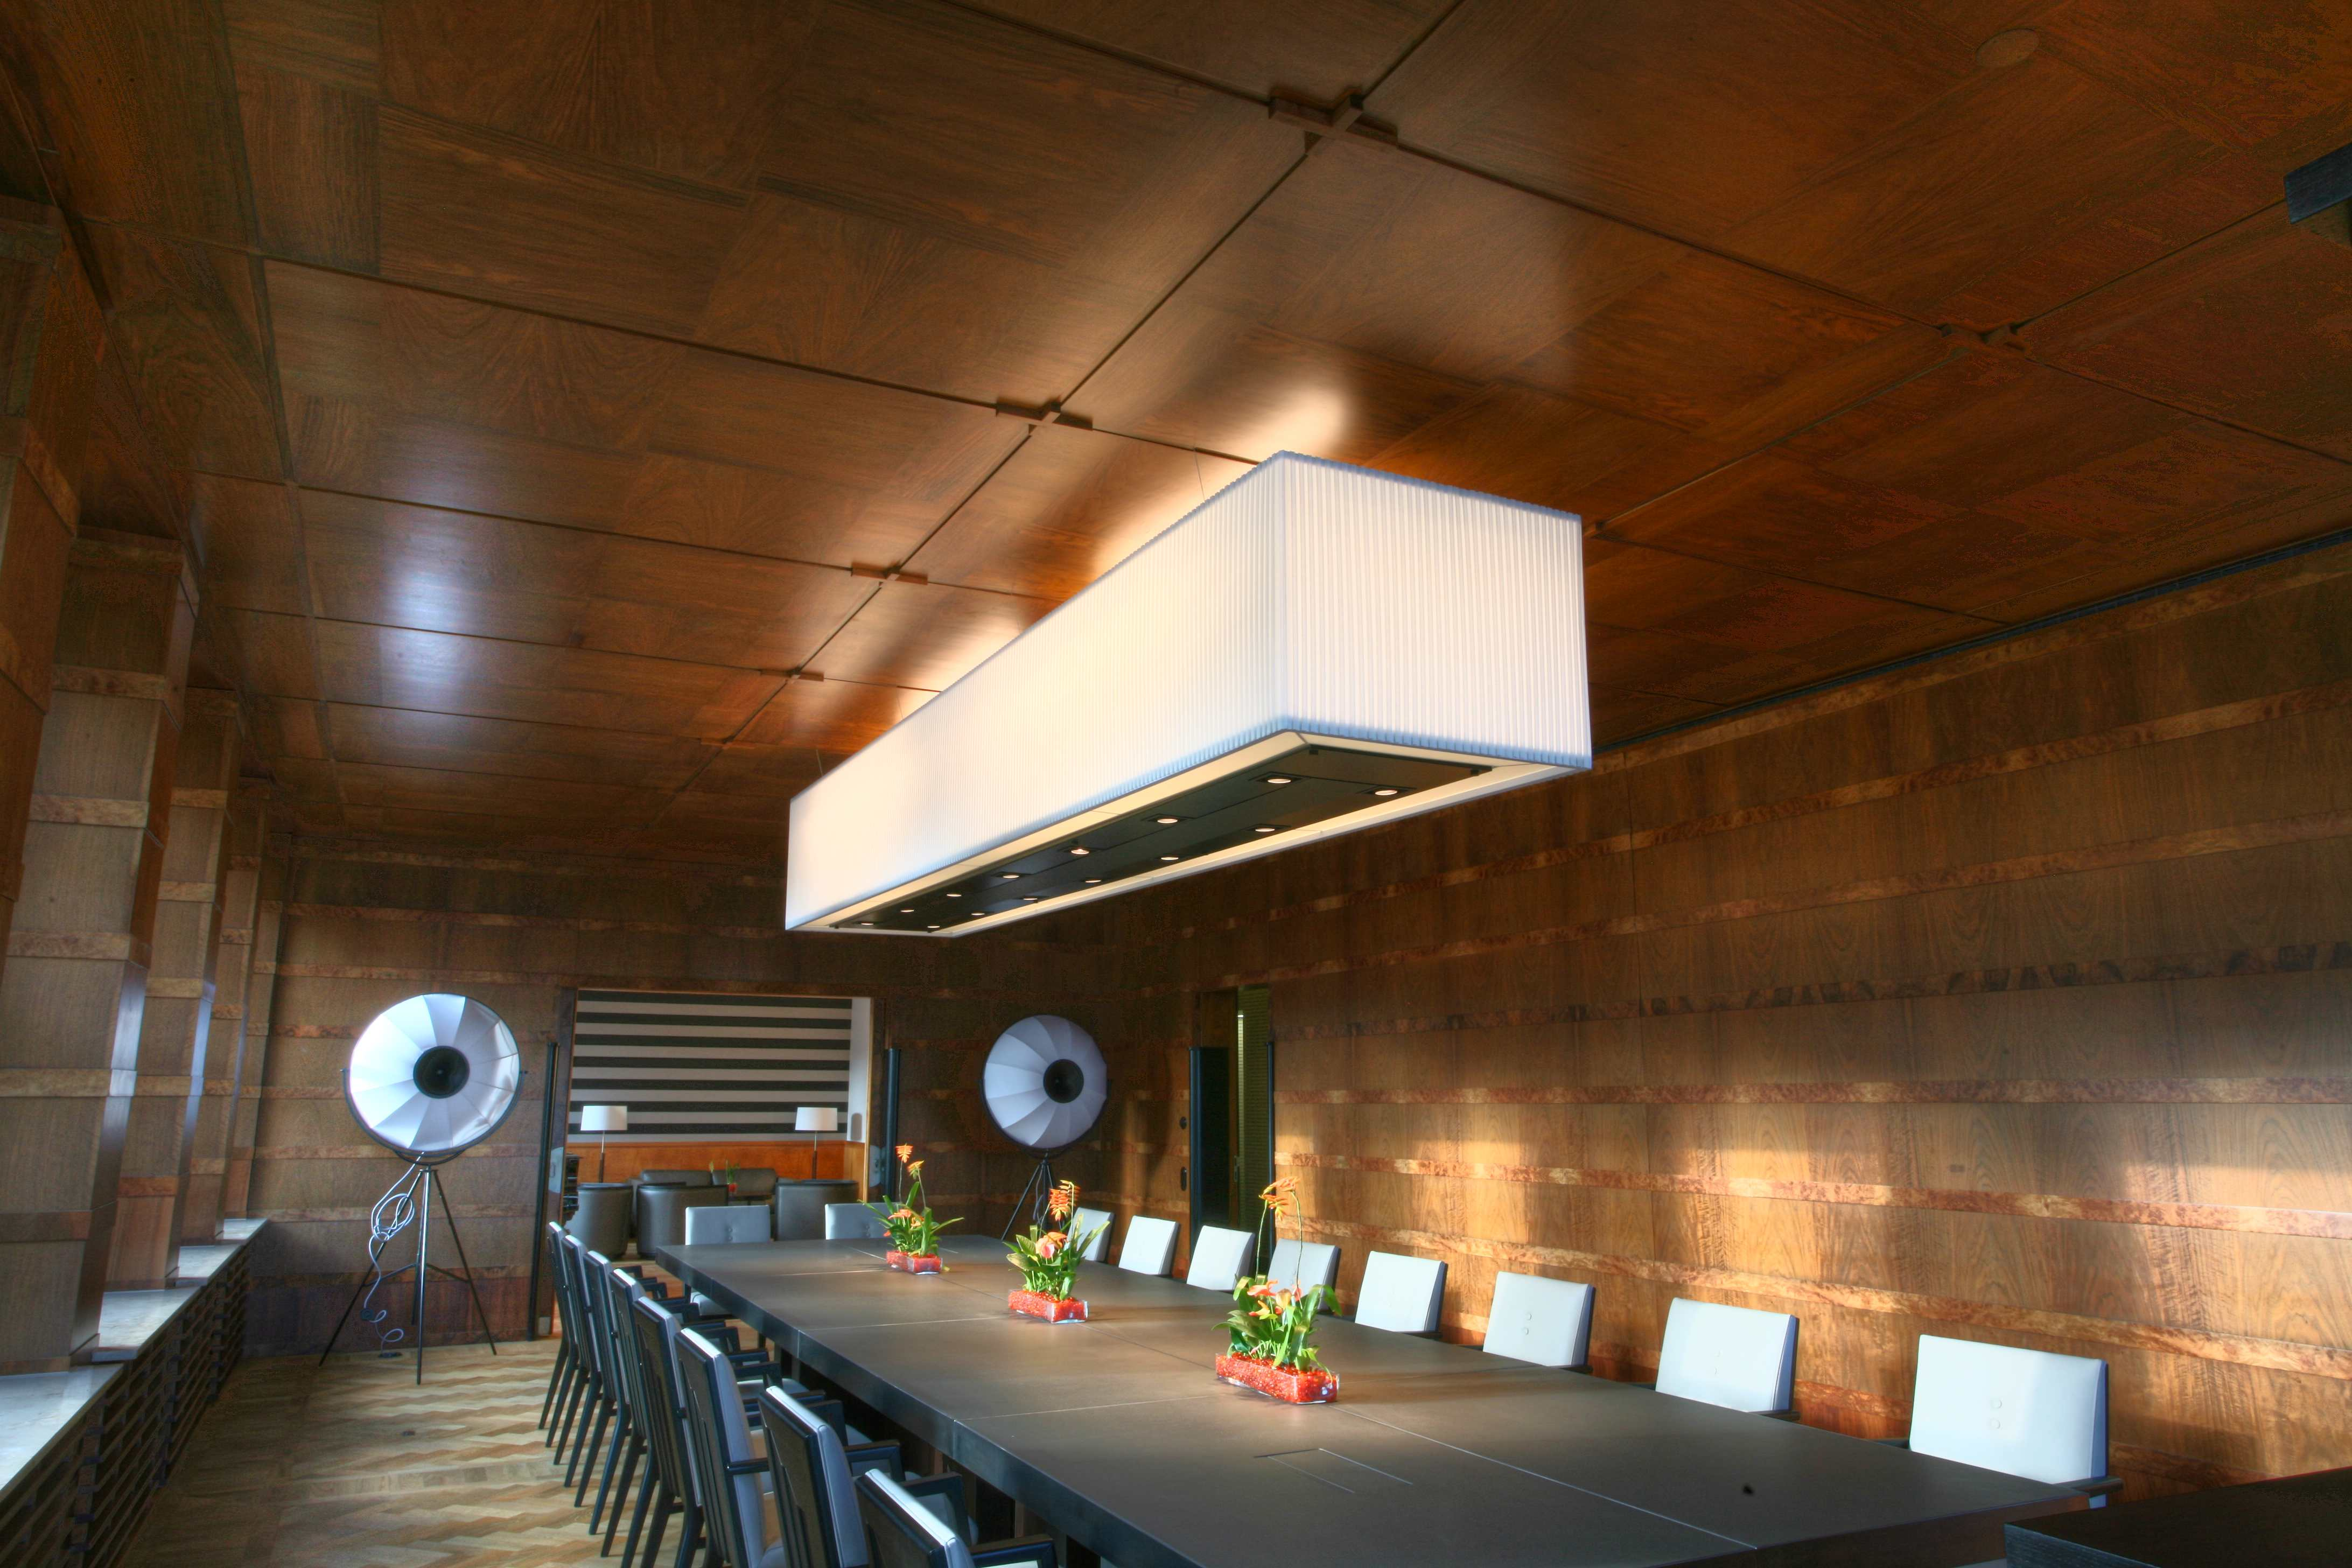 leuchten b ro referenzbilder peters design leuchten. Black Bedroom Furniture Sets. Home Design Ideas